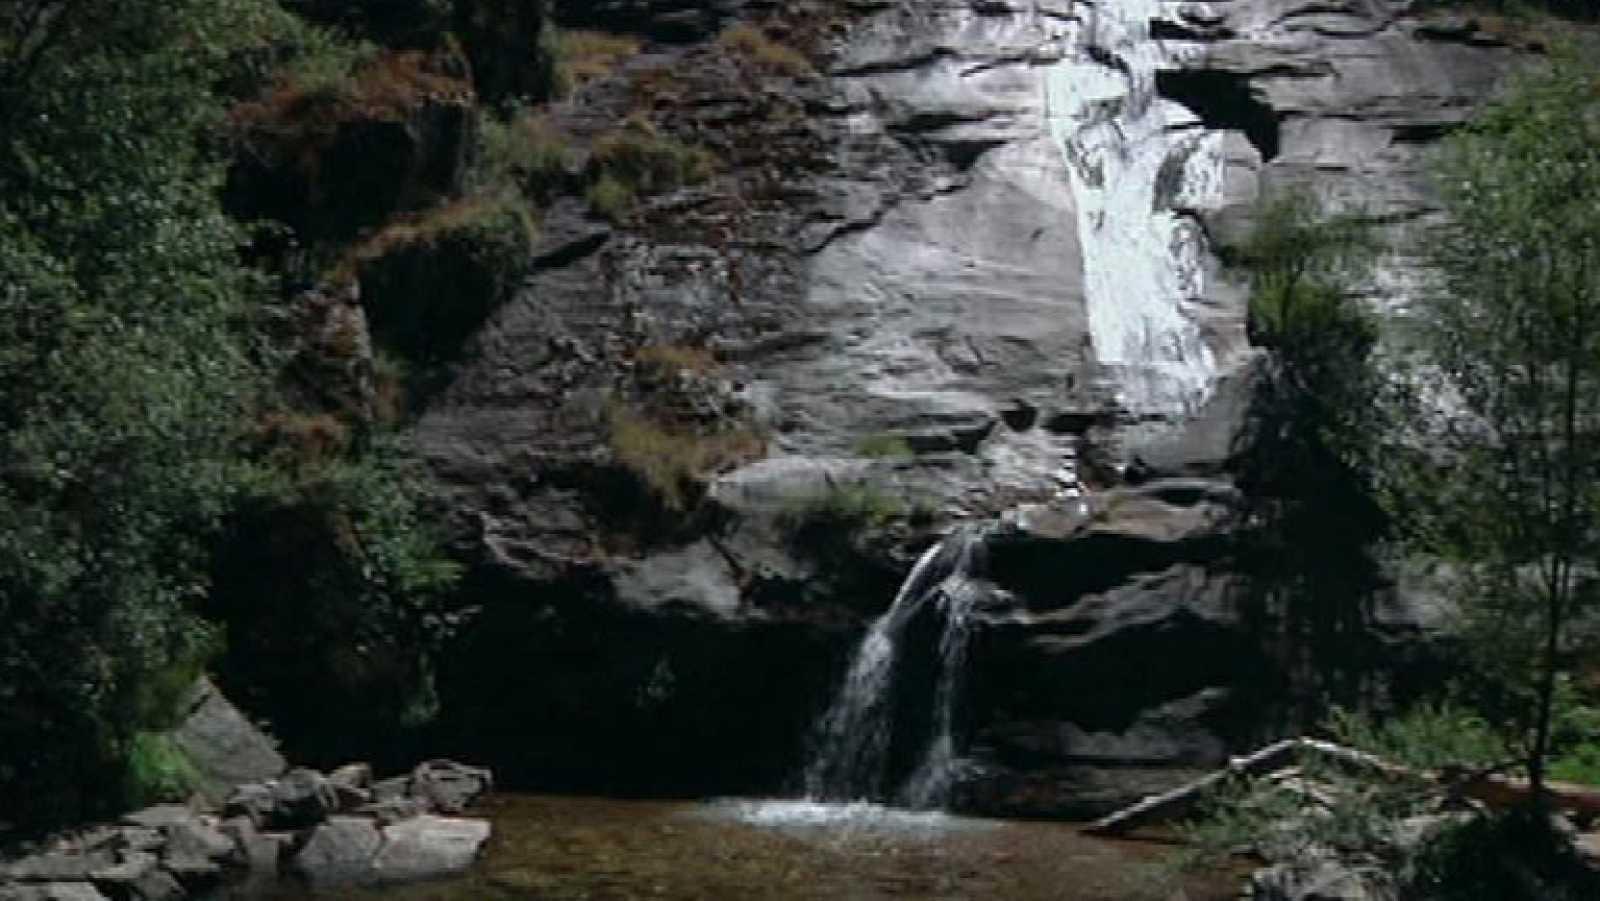 Aquí La Tierra El Chorro Una Piscina Natural En Segovia Rtvees